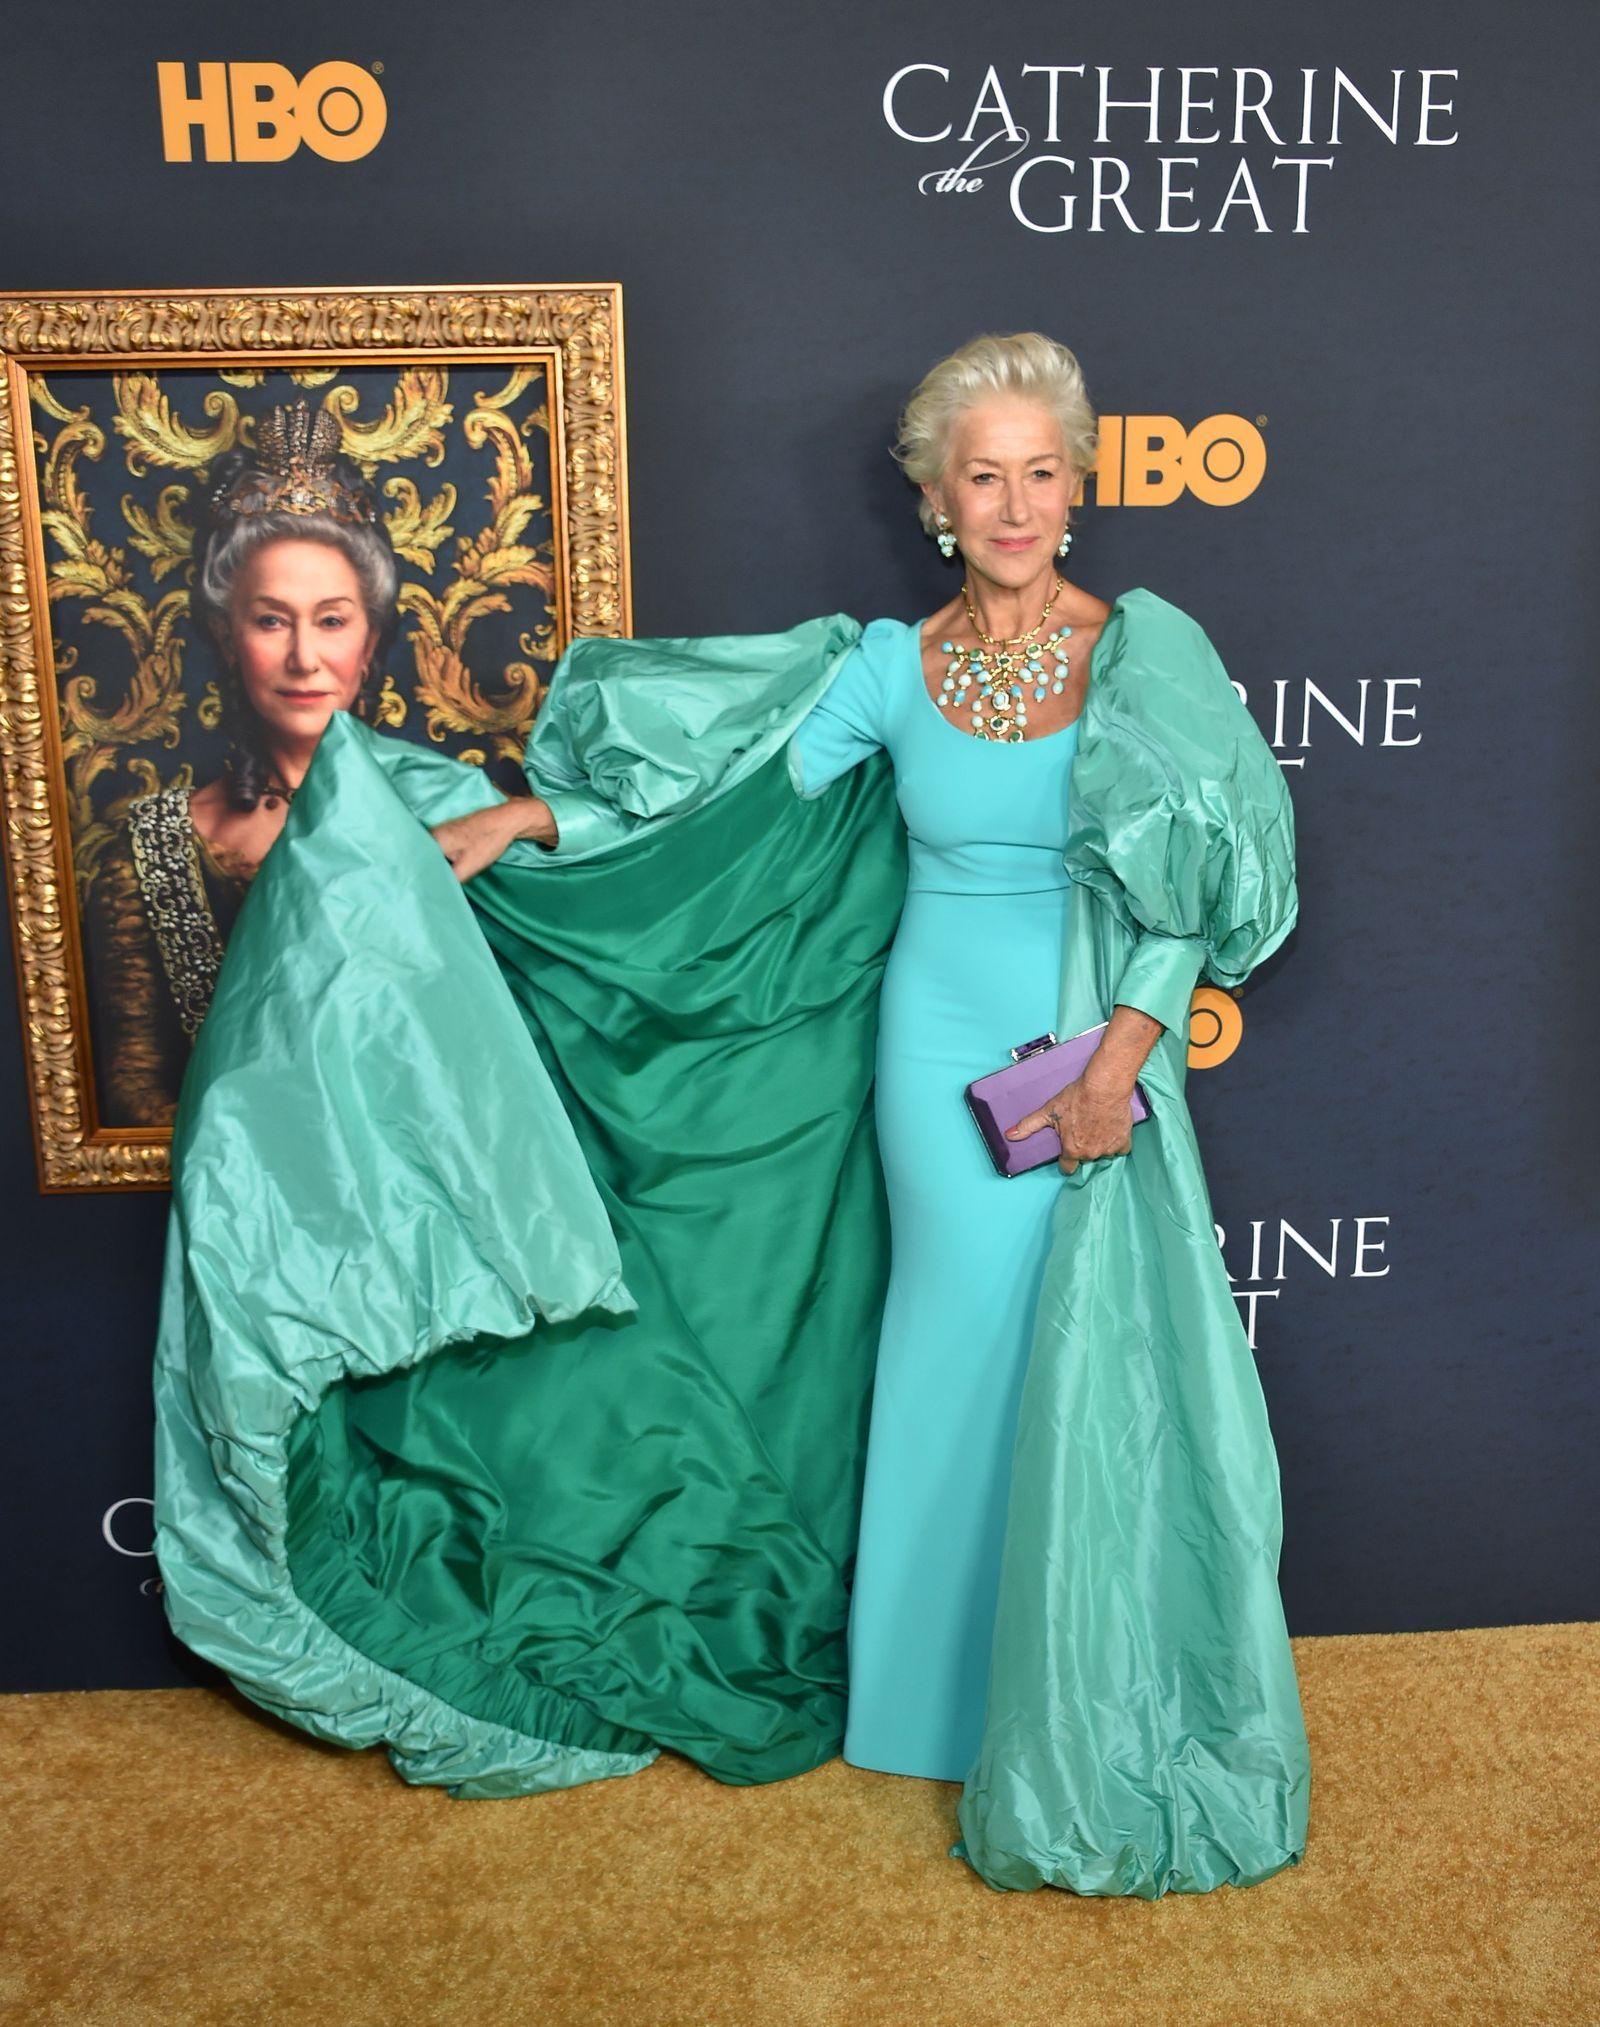 Helen Mirren Did Regal Like No Other In This Badgley Mischka Gown Badgley Mischka Gowns Badgley Mischka Helen Mirren